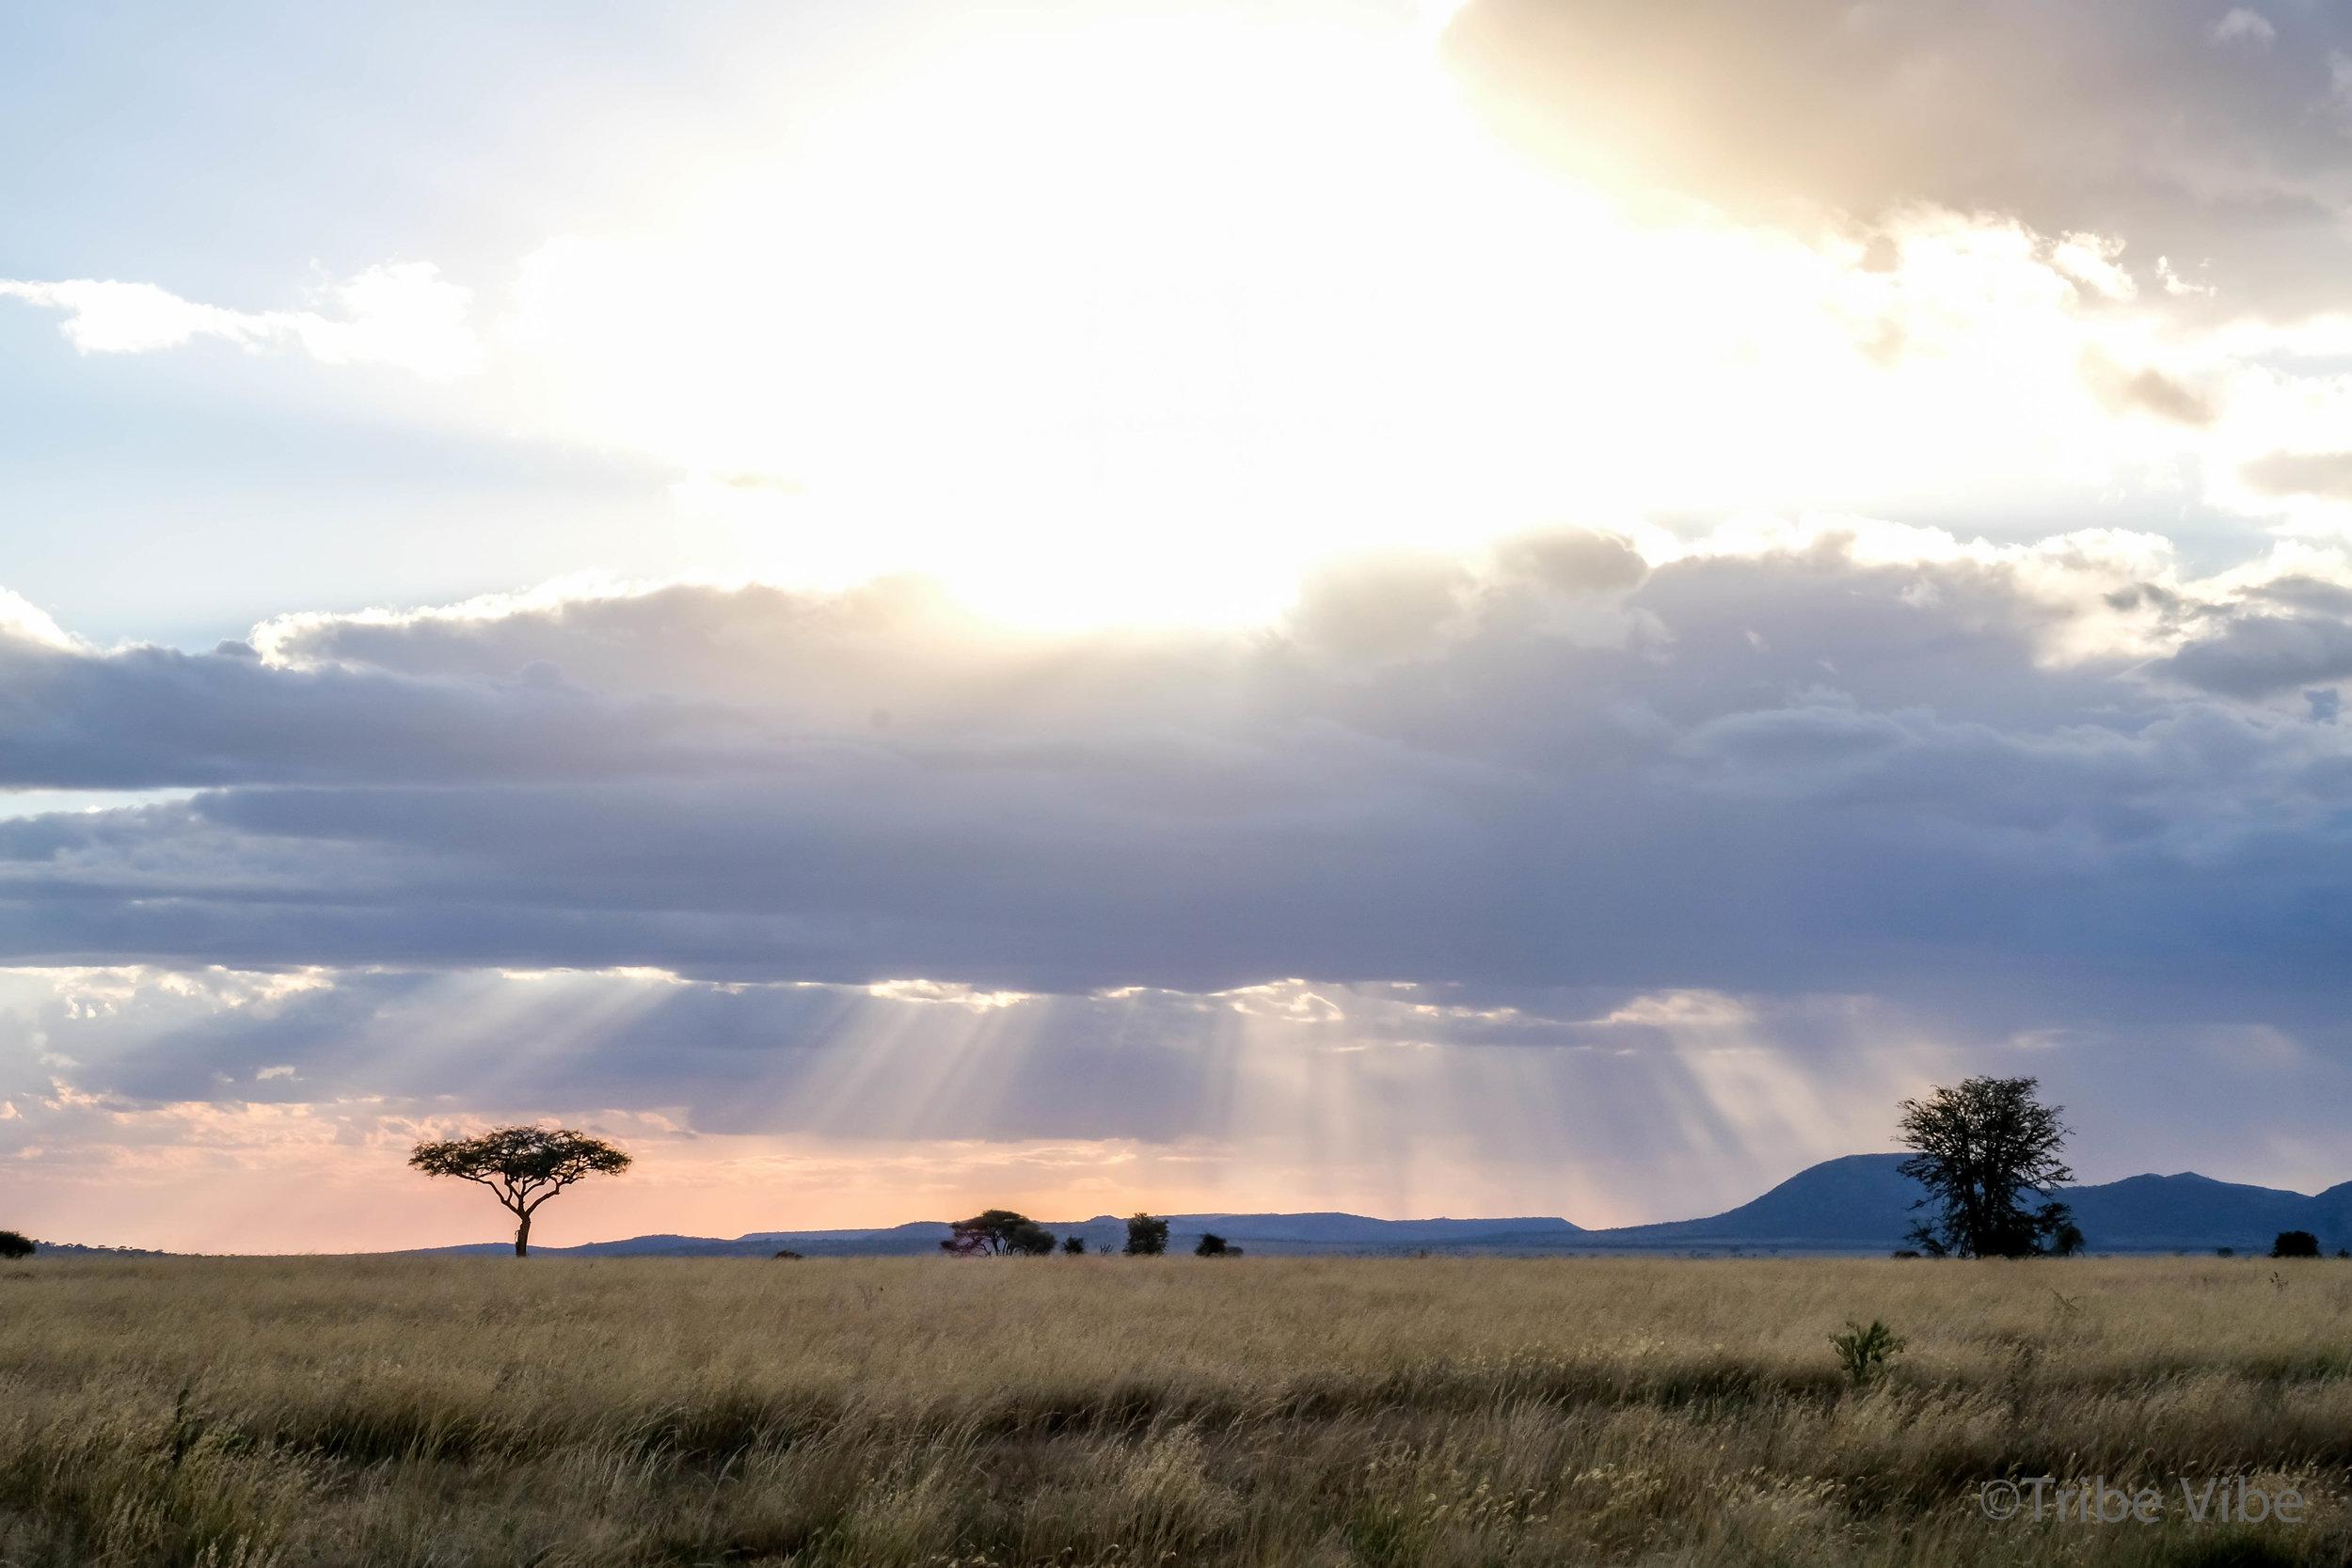 The beautiful landscape of the Serengeti